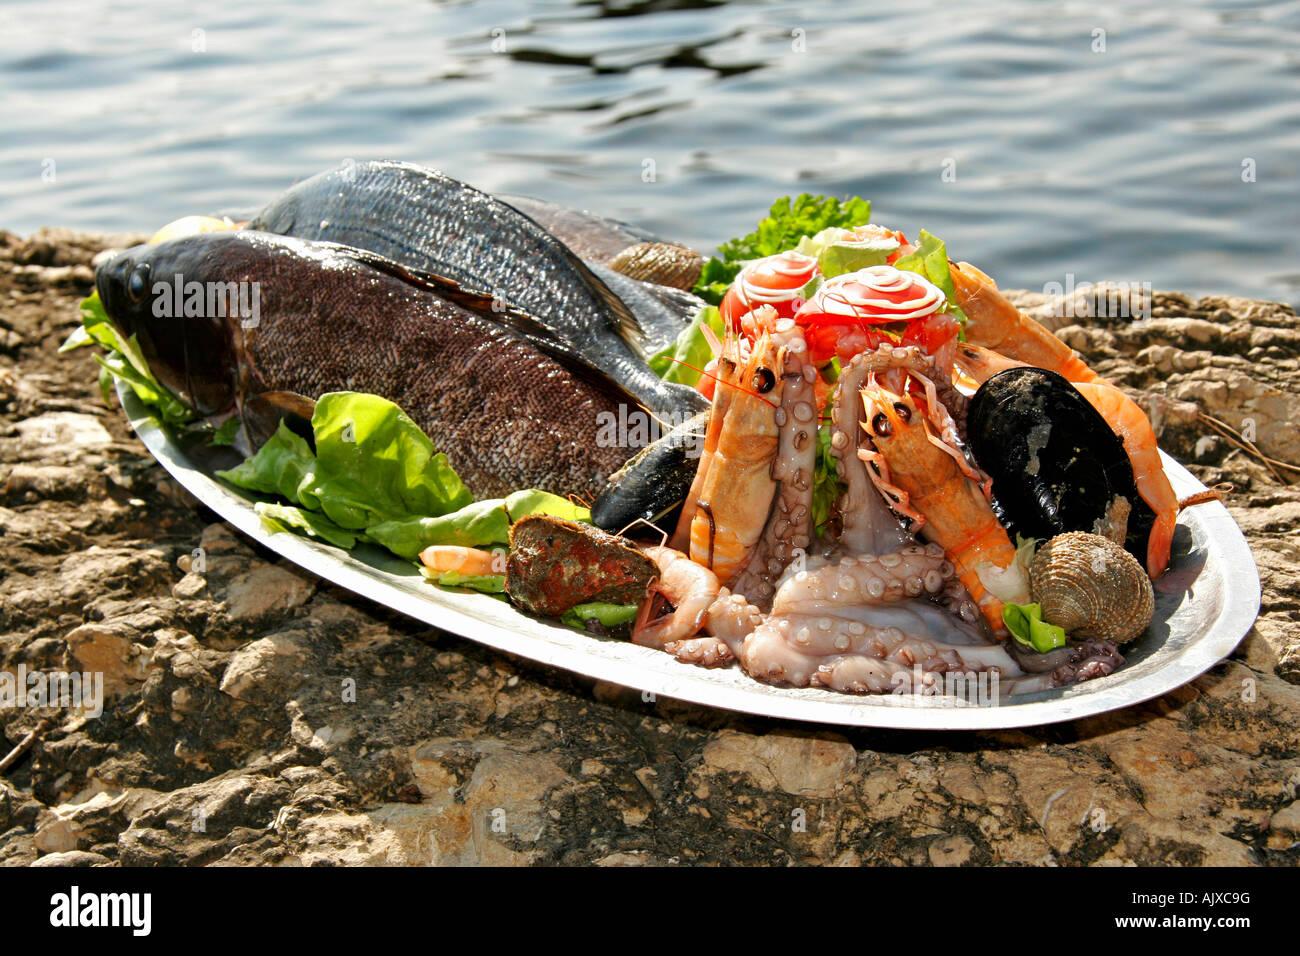 Kroatien Bucht, Restaurant Ankora am Hafen von Zaton Frische Meeresfruechte mit Gemuese | Croatia Fresh seafood - Stock Image